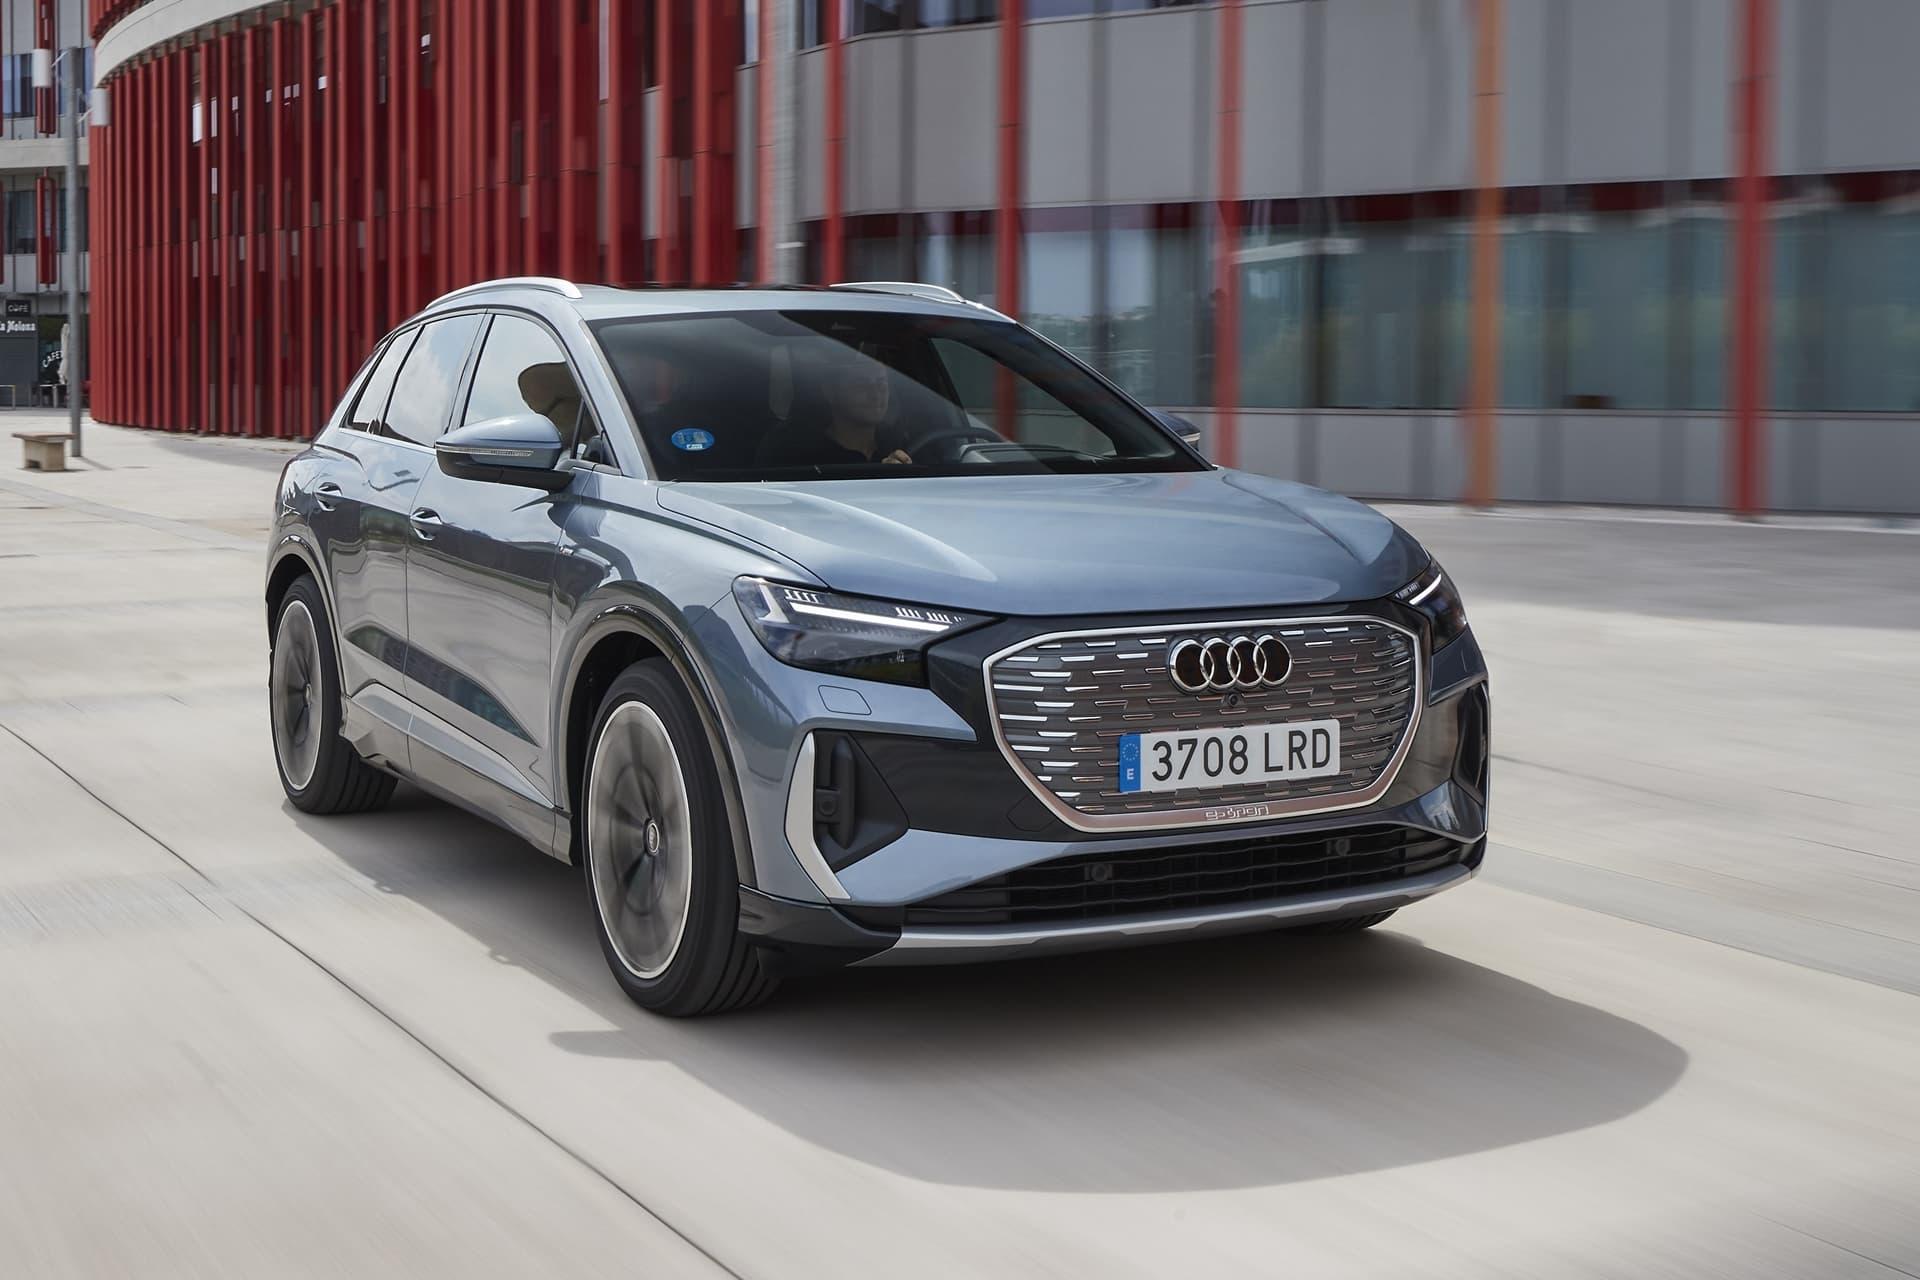 Audi Q4 E Tron 2021 0721 018